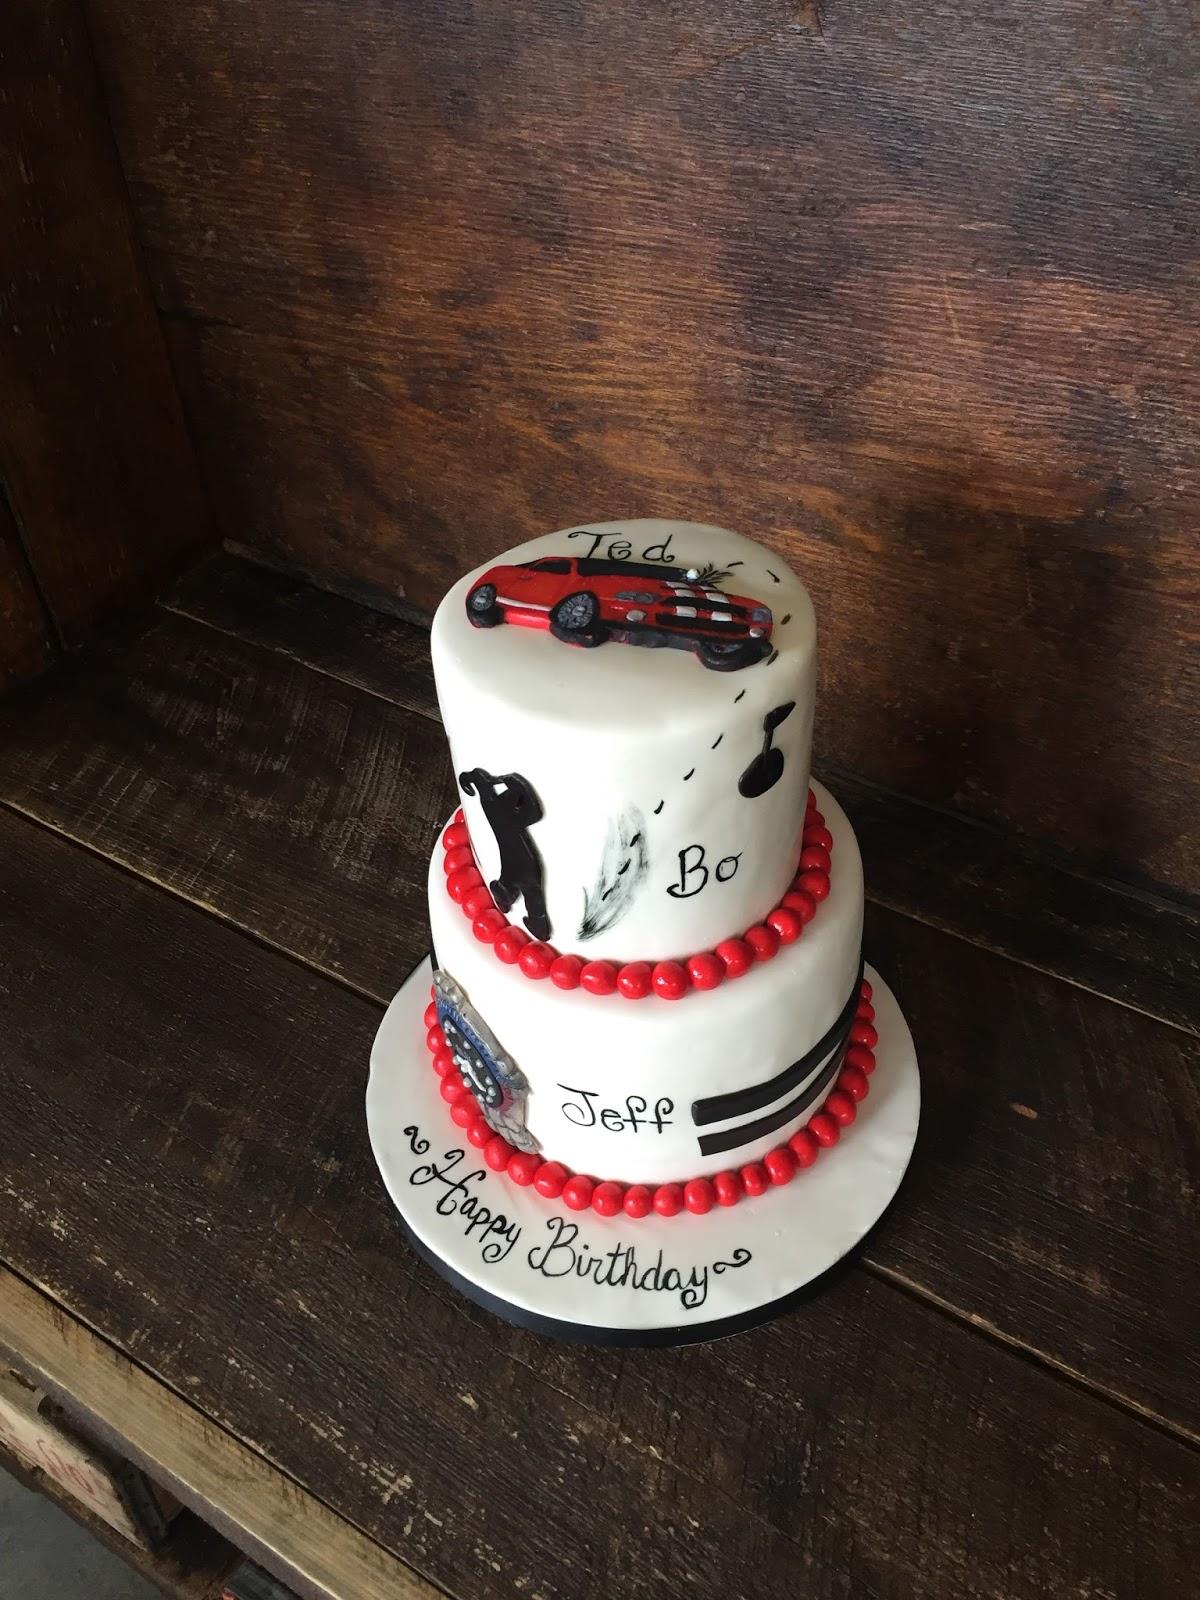 Sweet Ts Cake Design 3 Birthdays One Cake Mustang Shelby